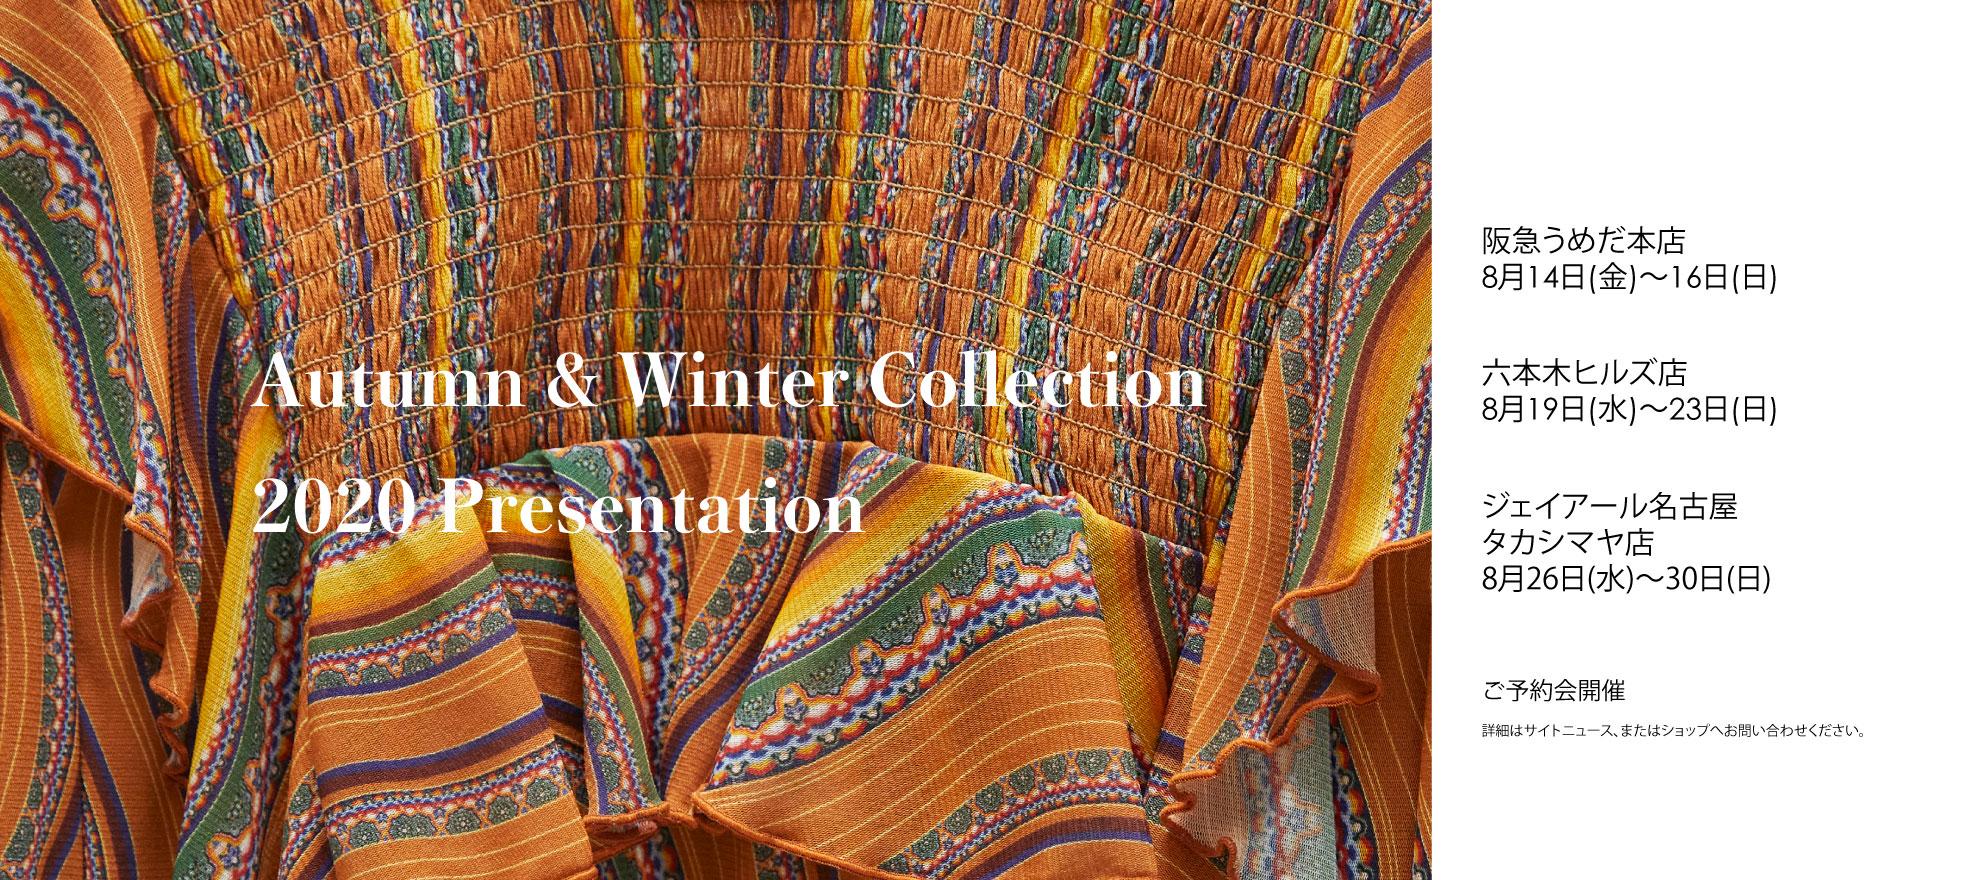 Autumn & Winter Collection 2020 Presentation